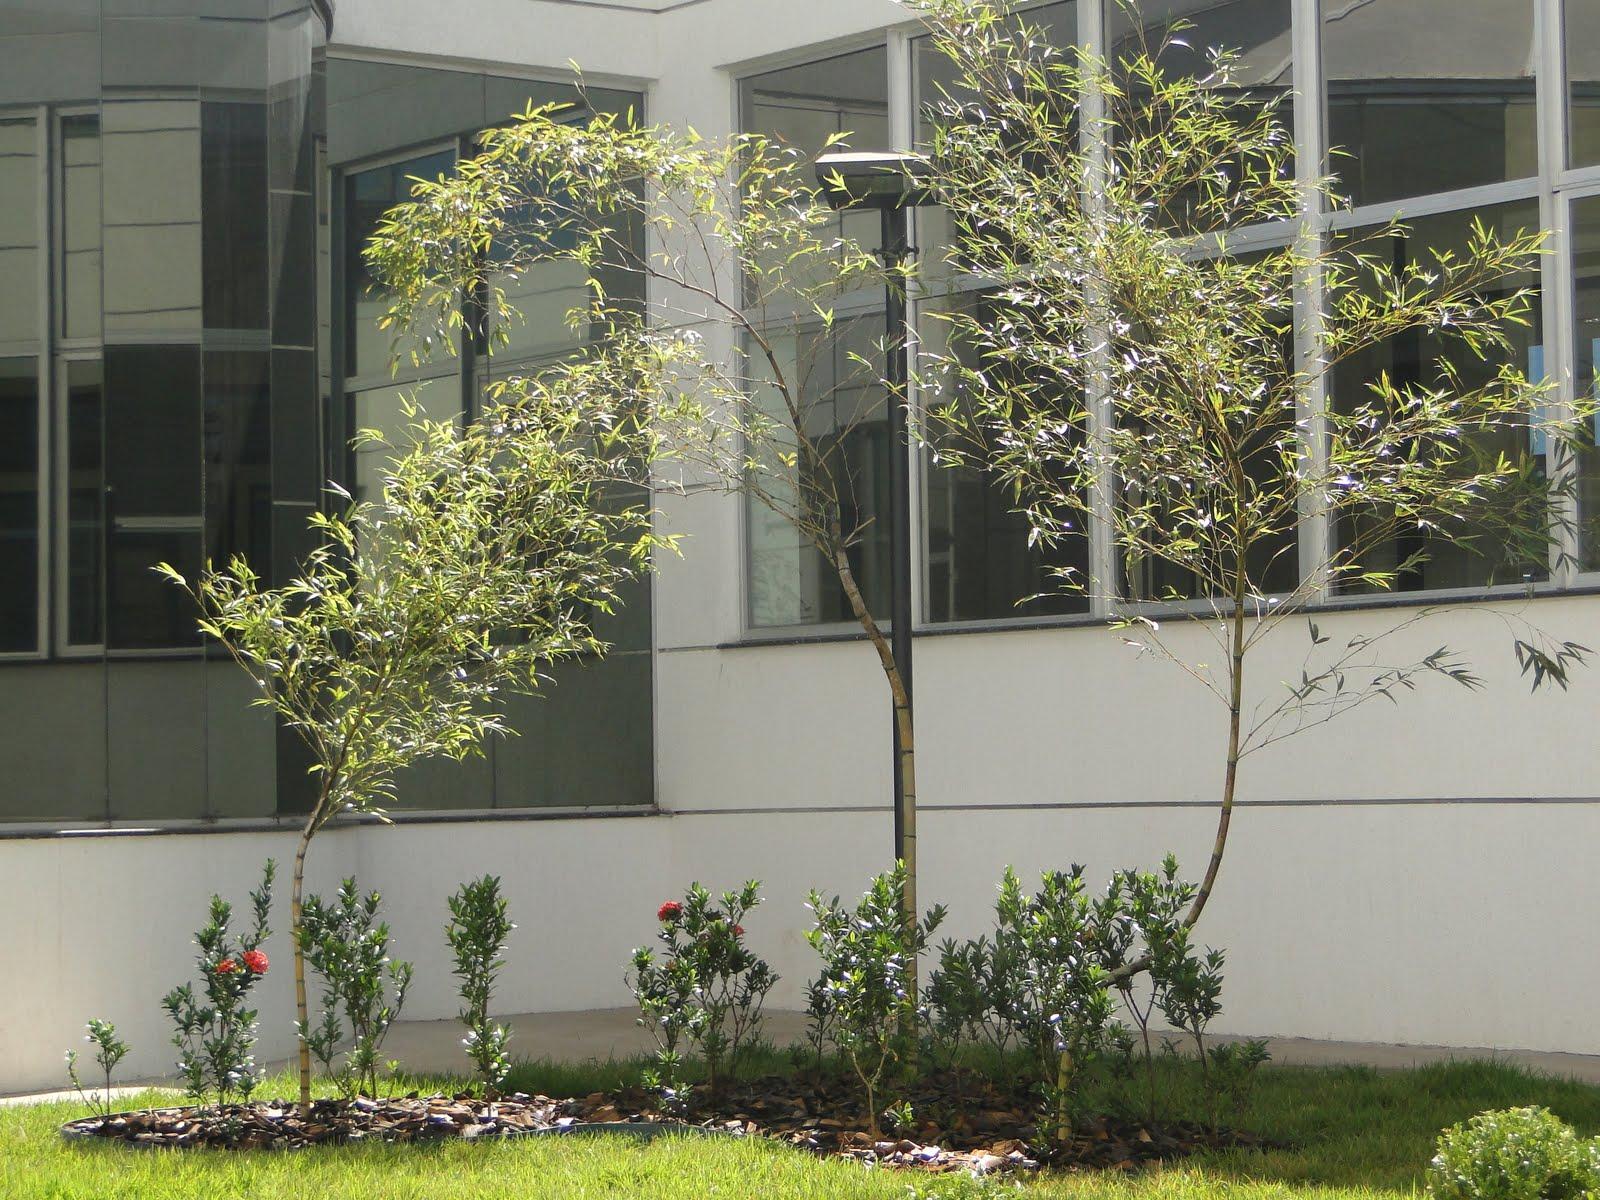 Casarim paisagismo by florestare jardim industrial for Jardin industrial